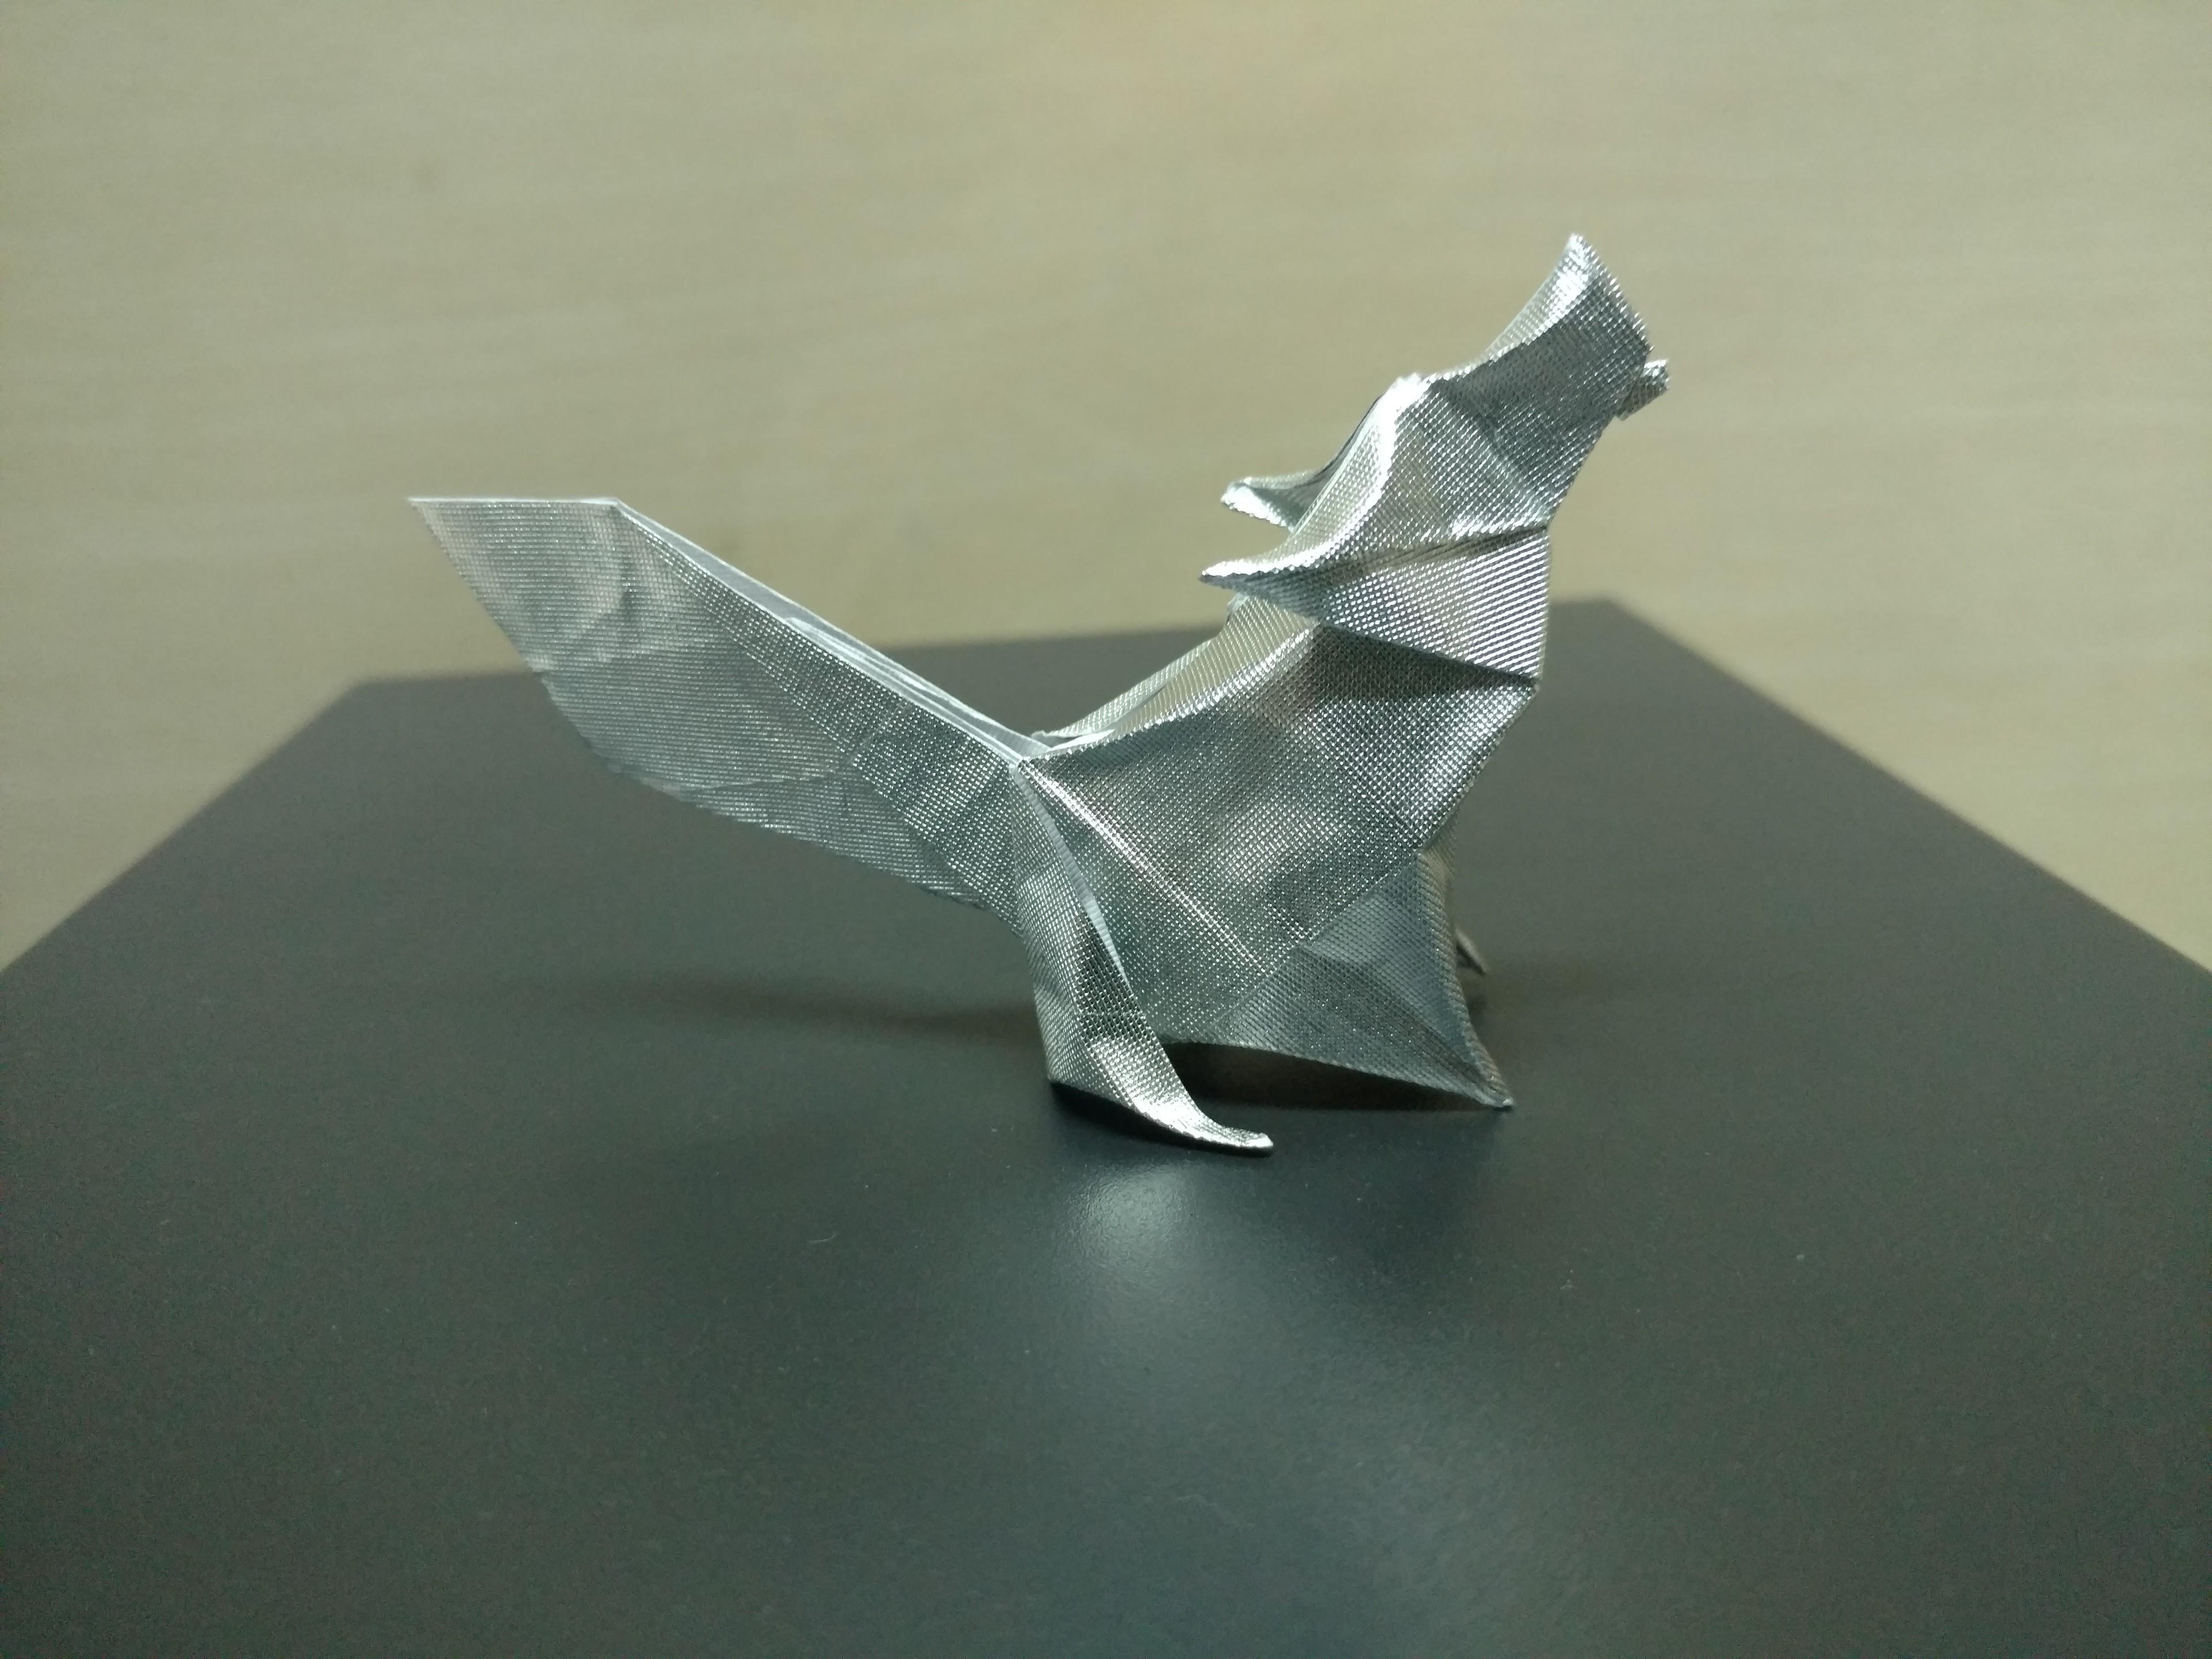 Shape-Shifting Origami Creations By Jo Nakashima | 3464x4618